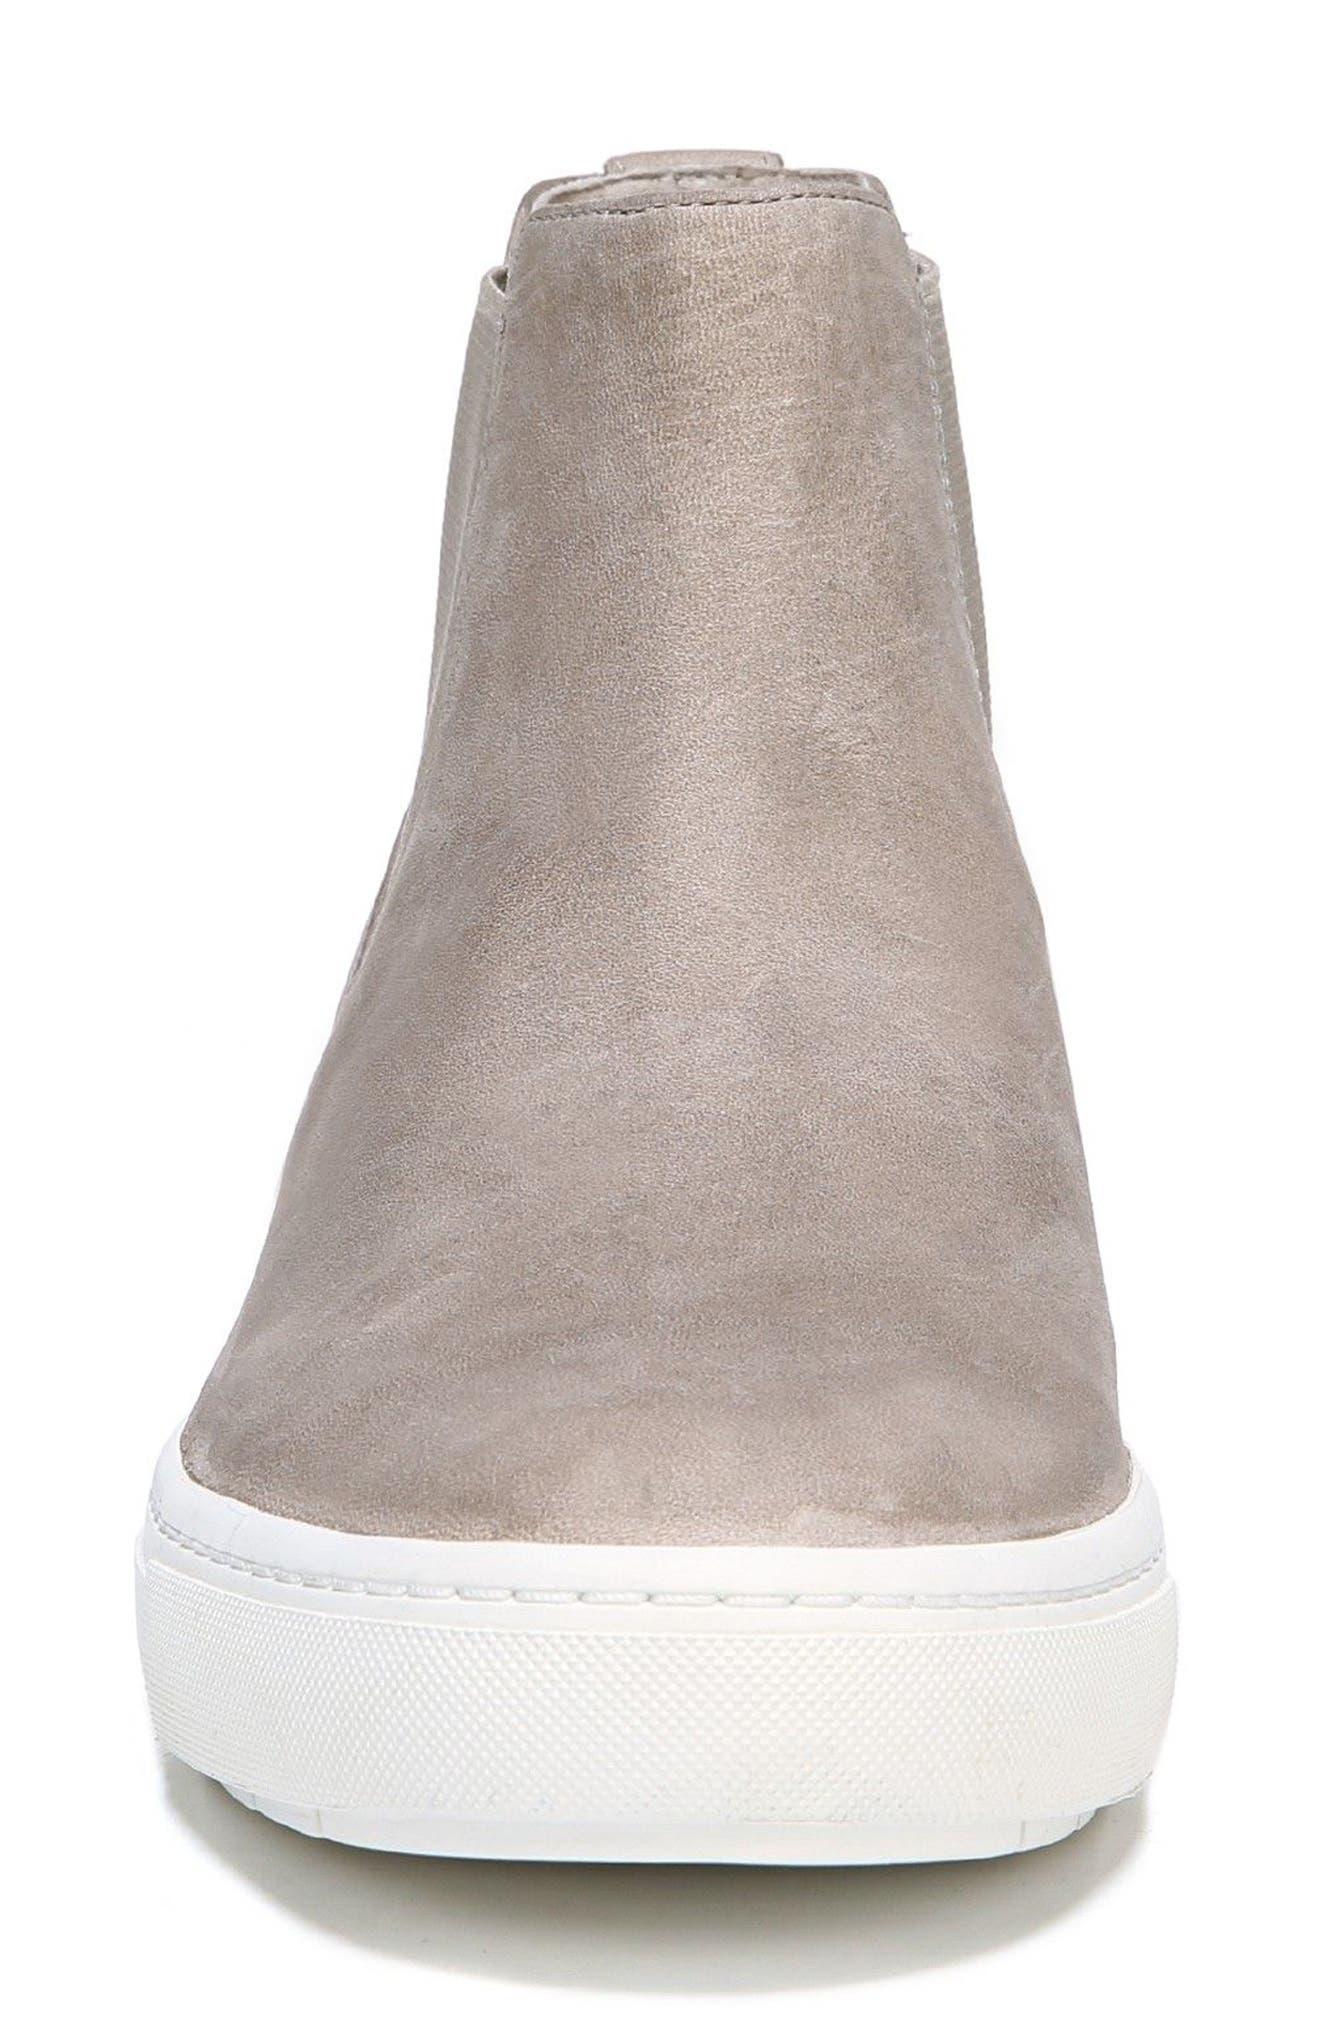 Newlyn High Top Sneaker,                             Alternate thumbnail 42, color,